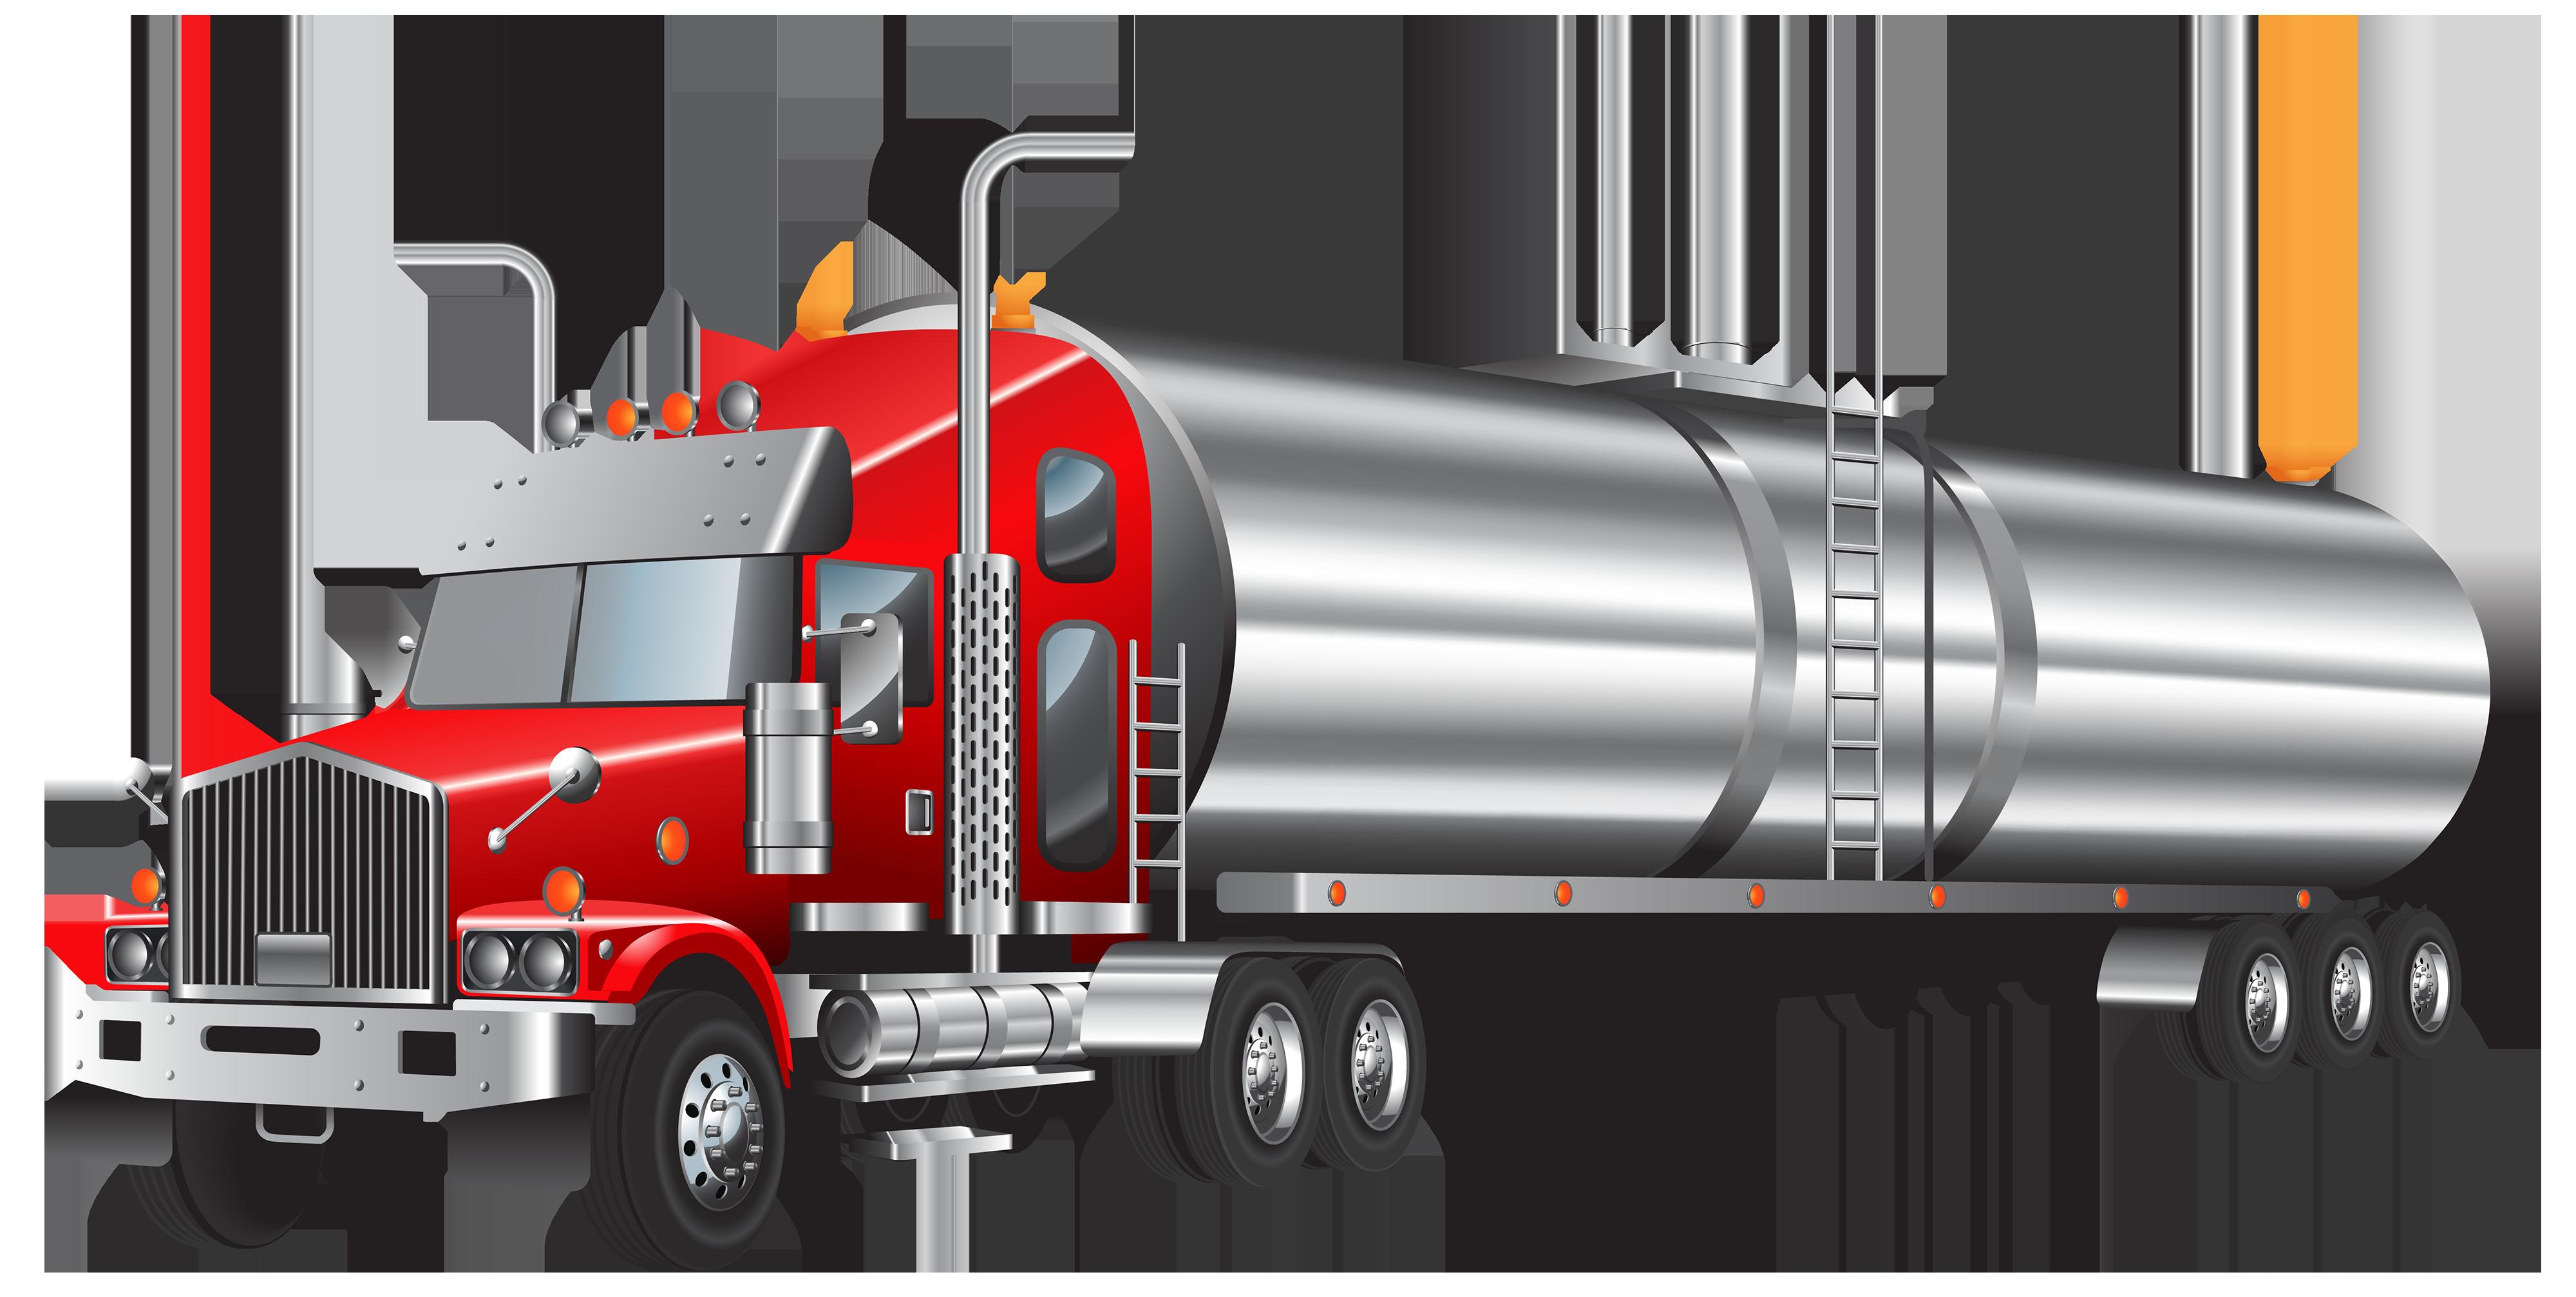 4000x2014 Tank Truck Png Clipart